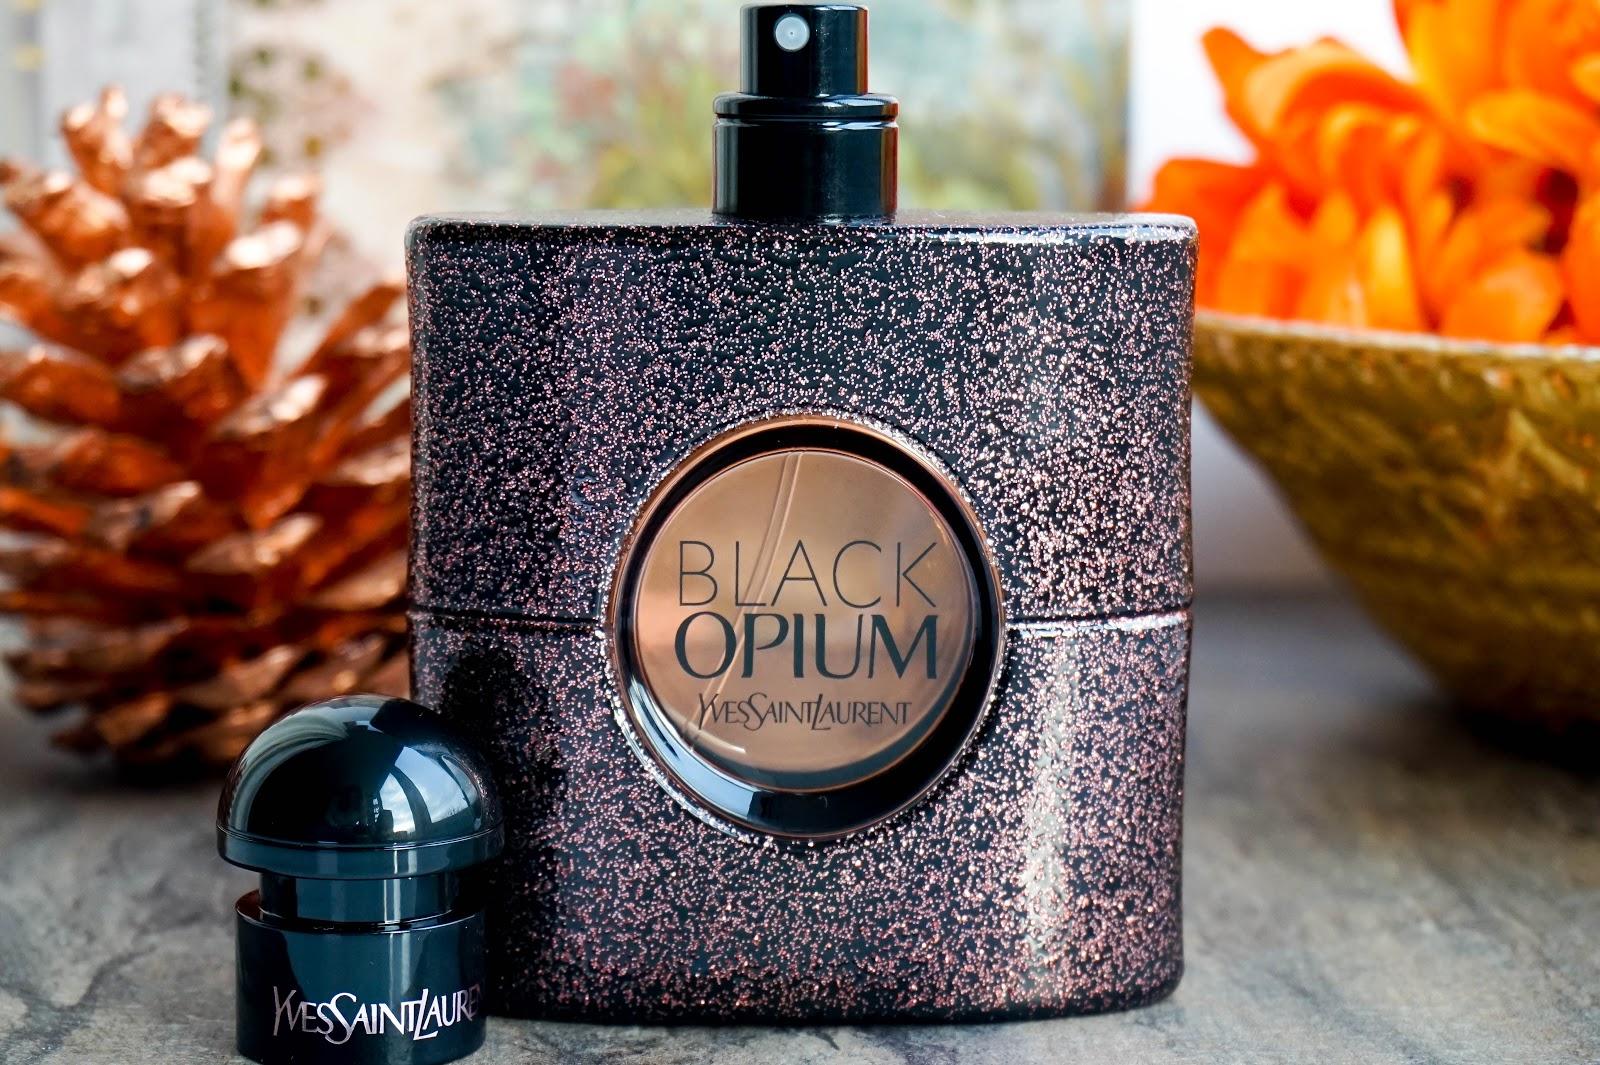 Opium black perfume debenhams dresses